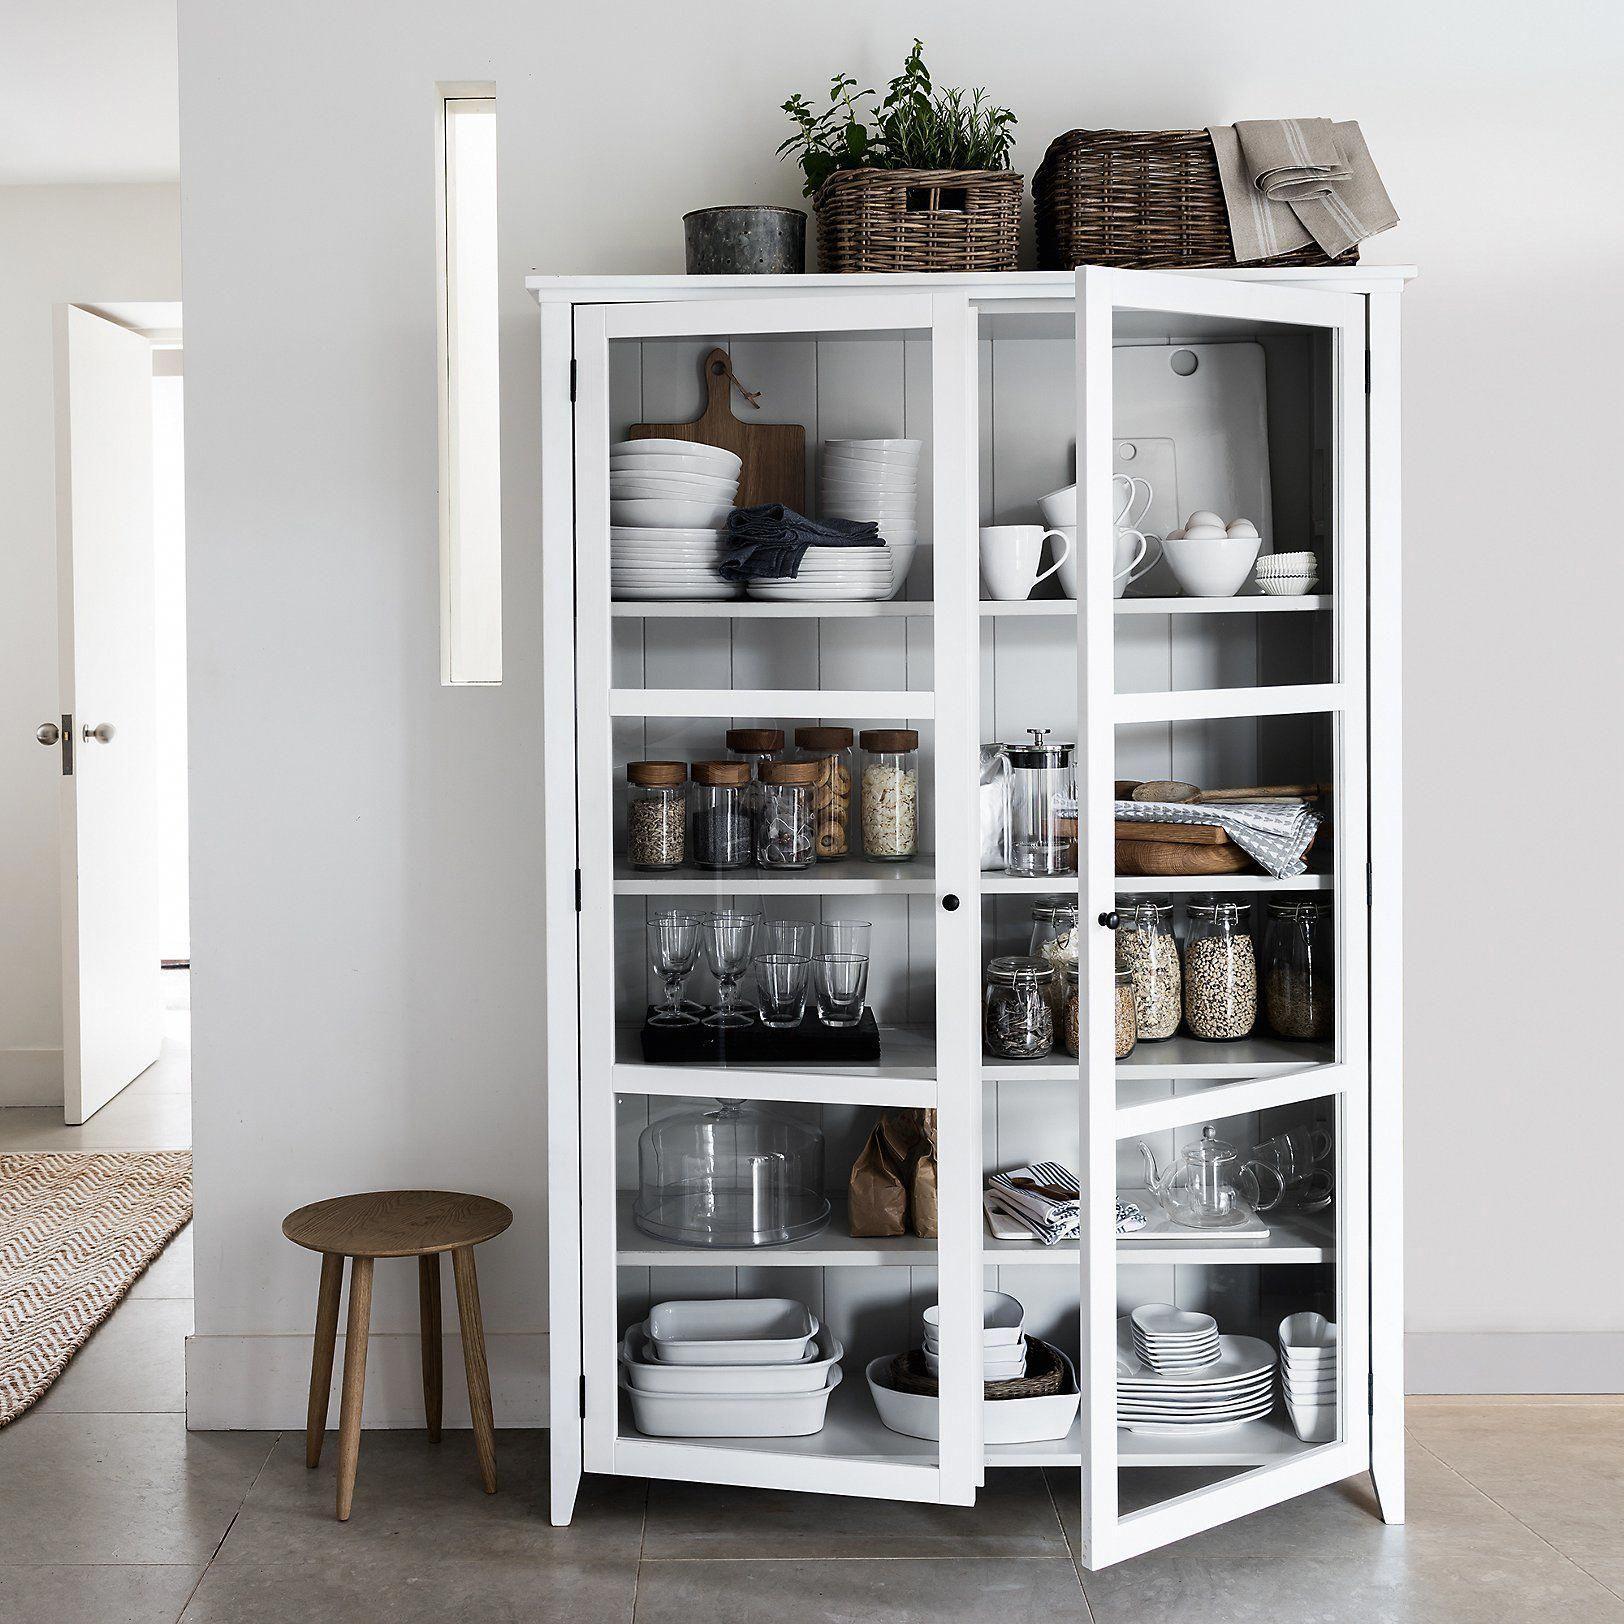 Modernfurniturelowprice Info 5251673998 Glass Cabinets Display Kitchen Display Cabinet Cabinet Furniture